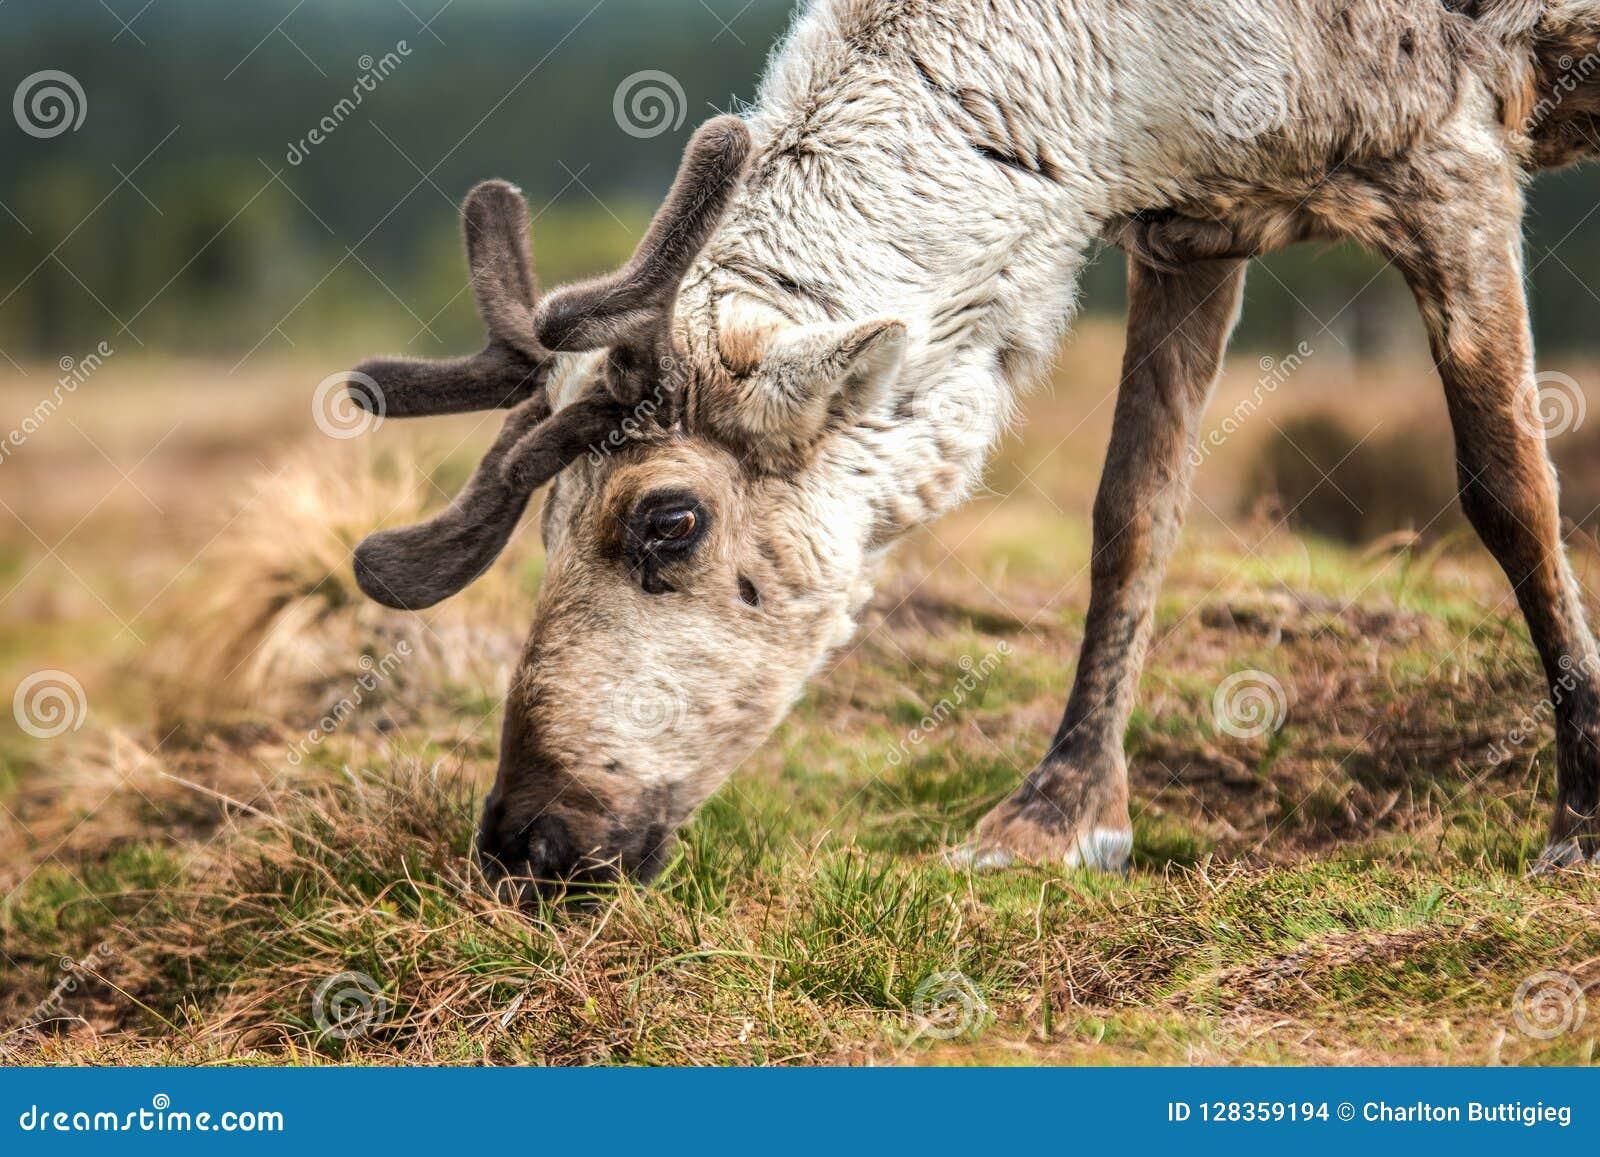 Reindeer on a hill